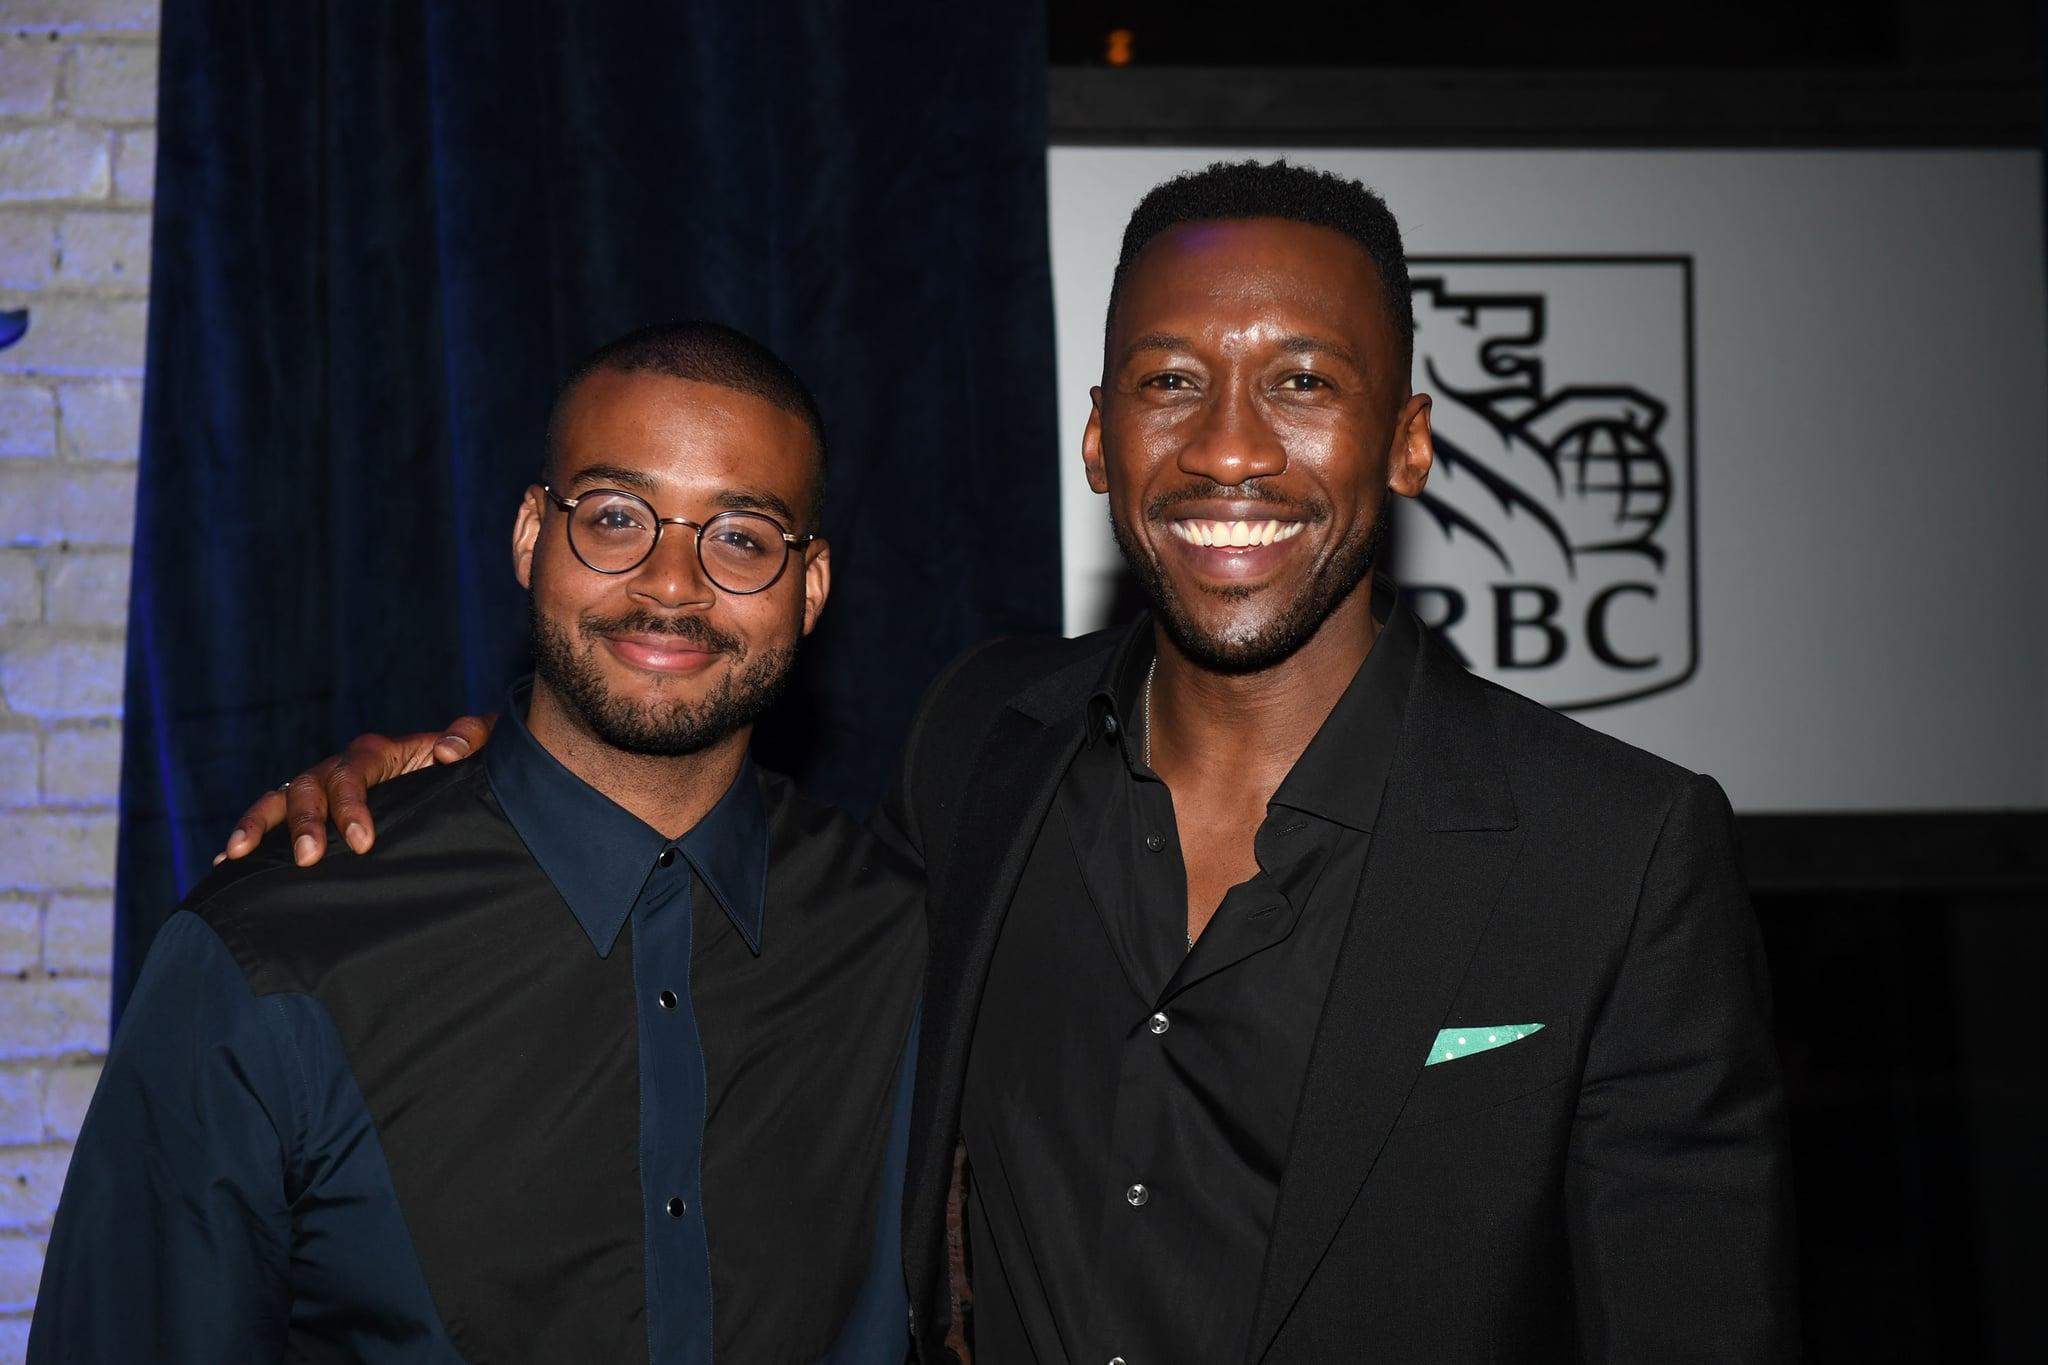 TORONTO, ON - SEPTEMBER 11:  Kris Bowers and Mahershala Ali attend RBC hosted